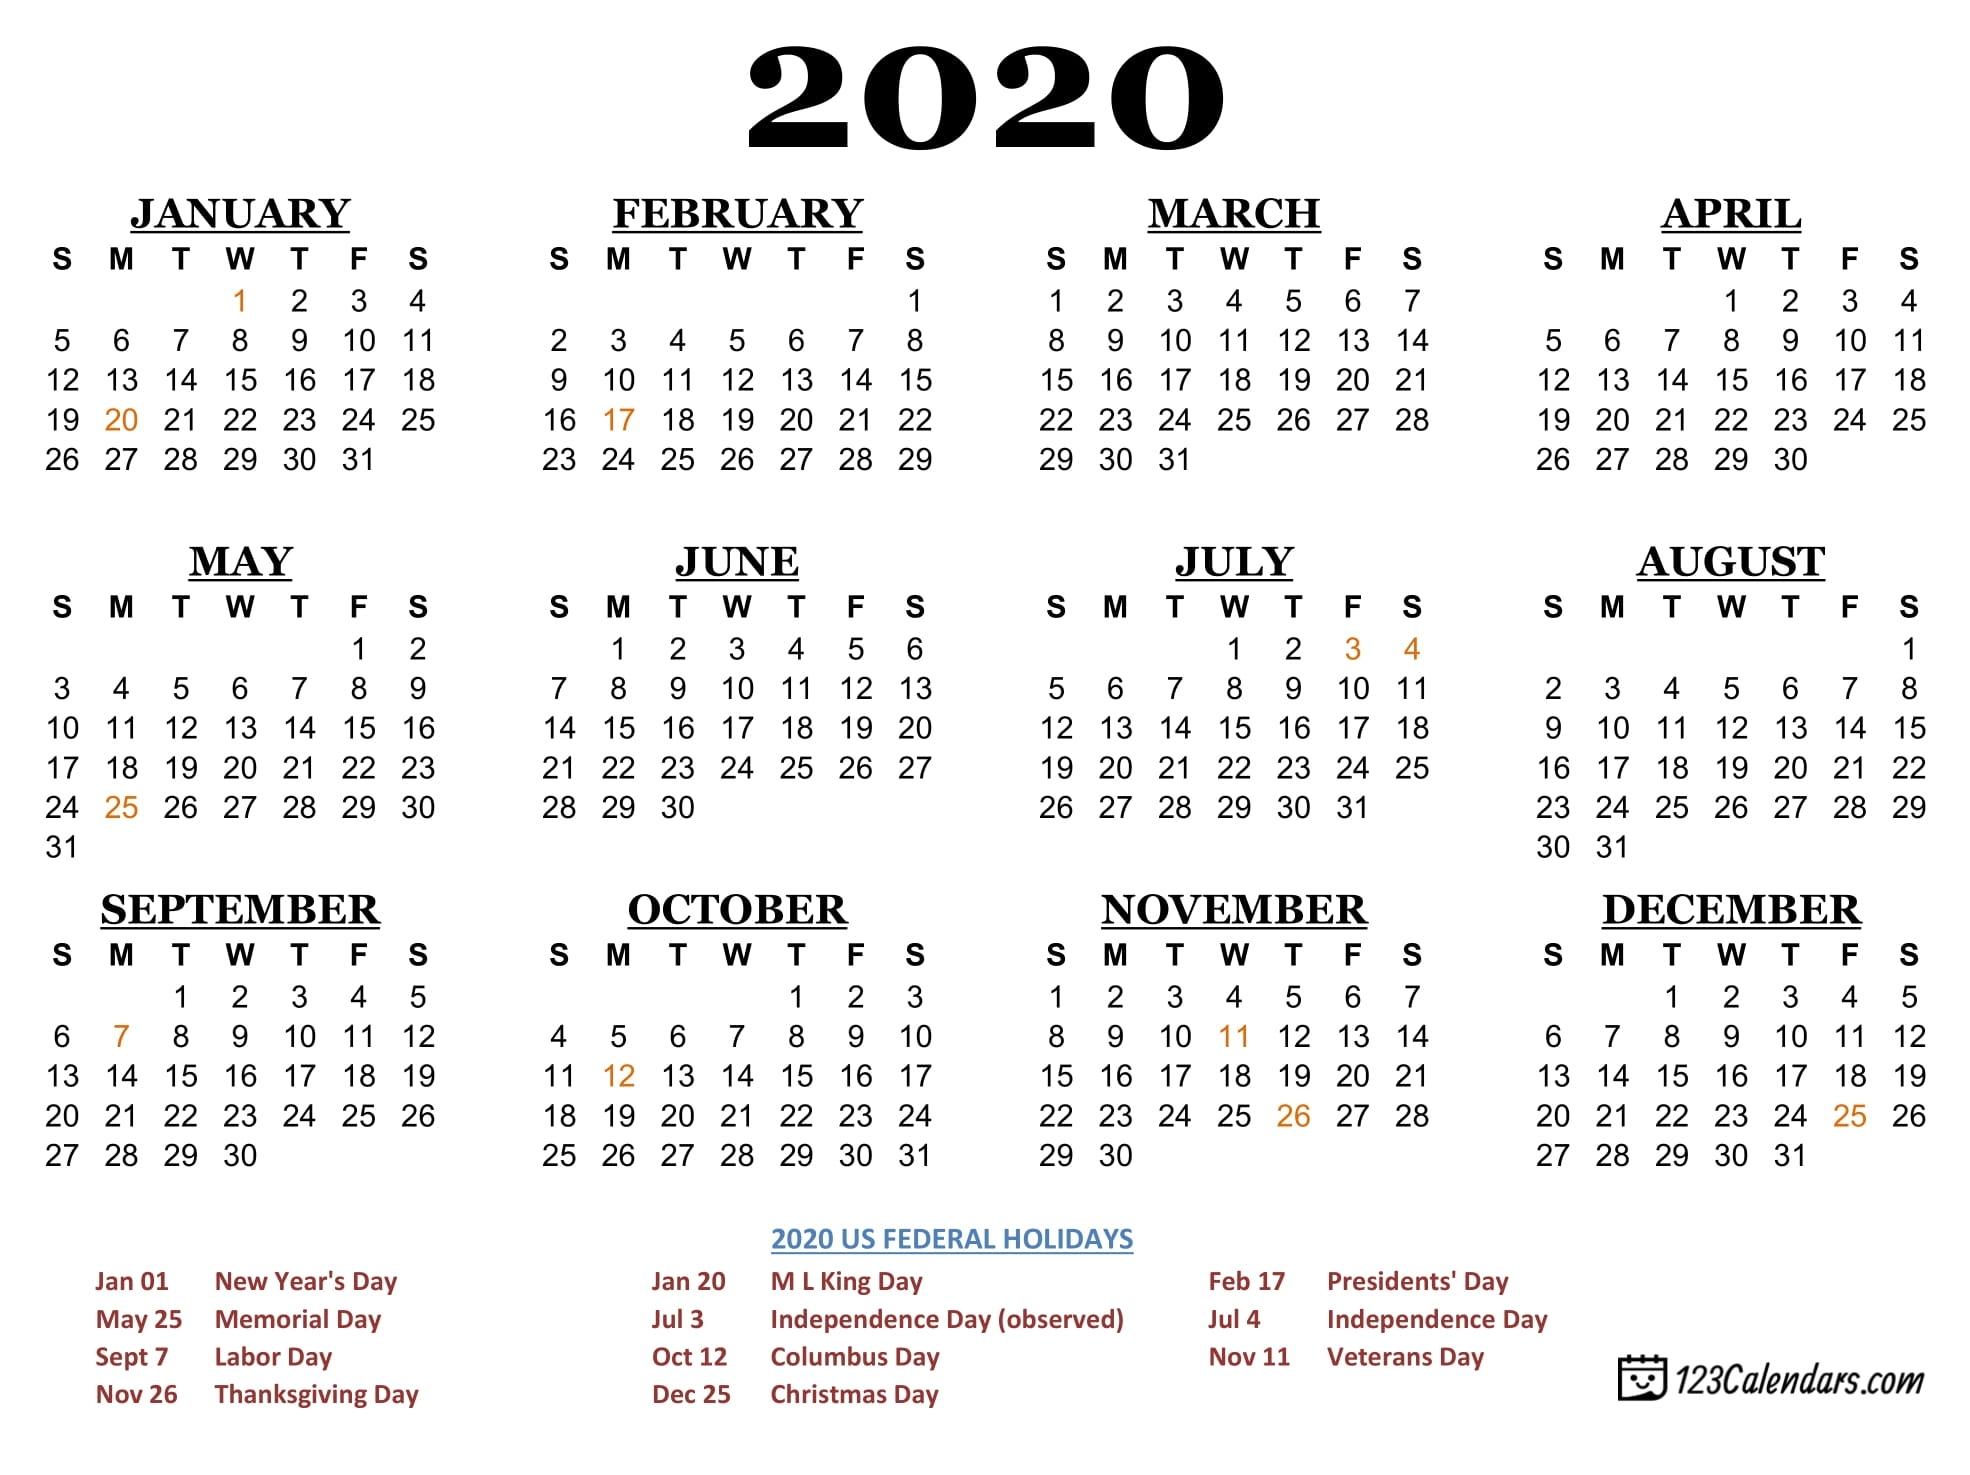 Free Printable Year 2020 Calendar | 123Calendarsmonday To throughout Printable Calendars From 123Calendars